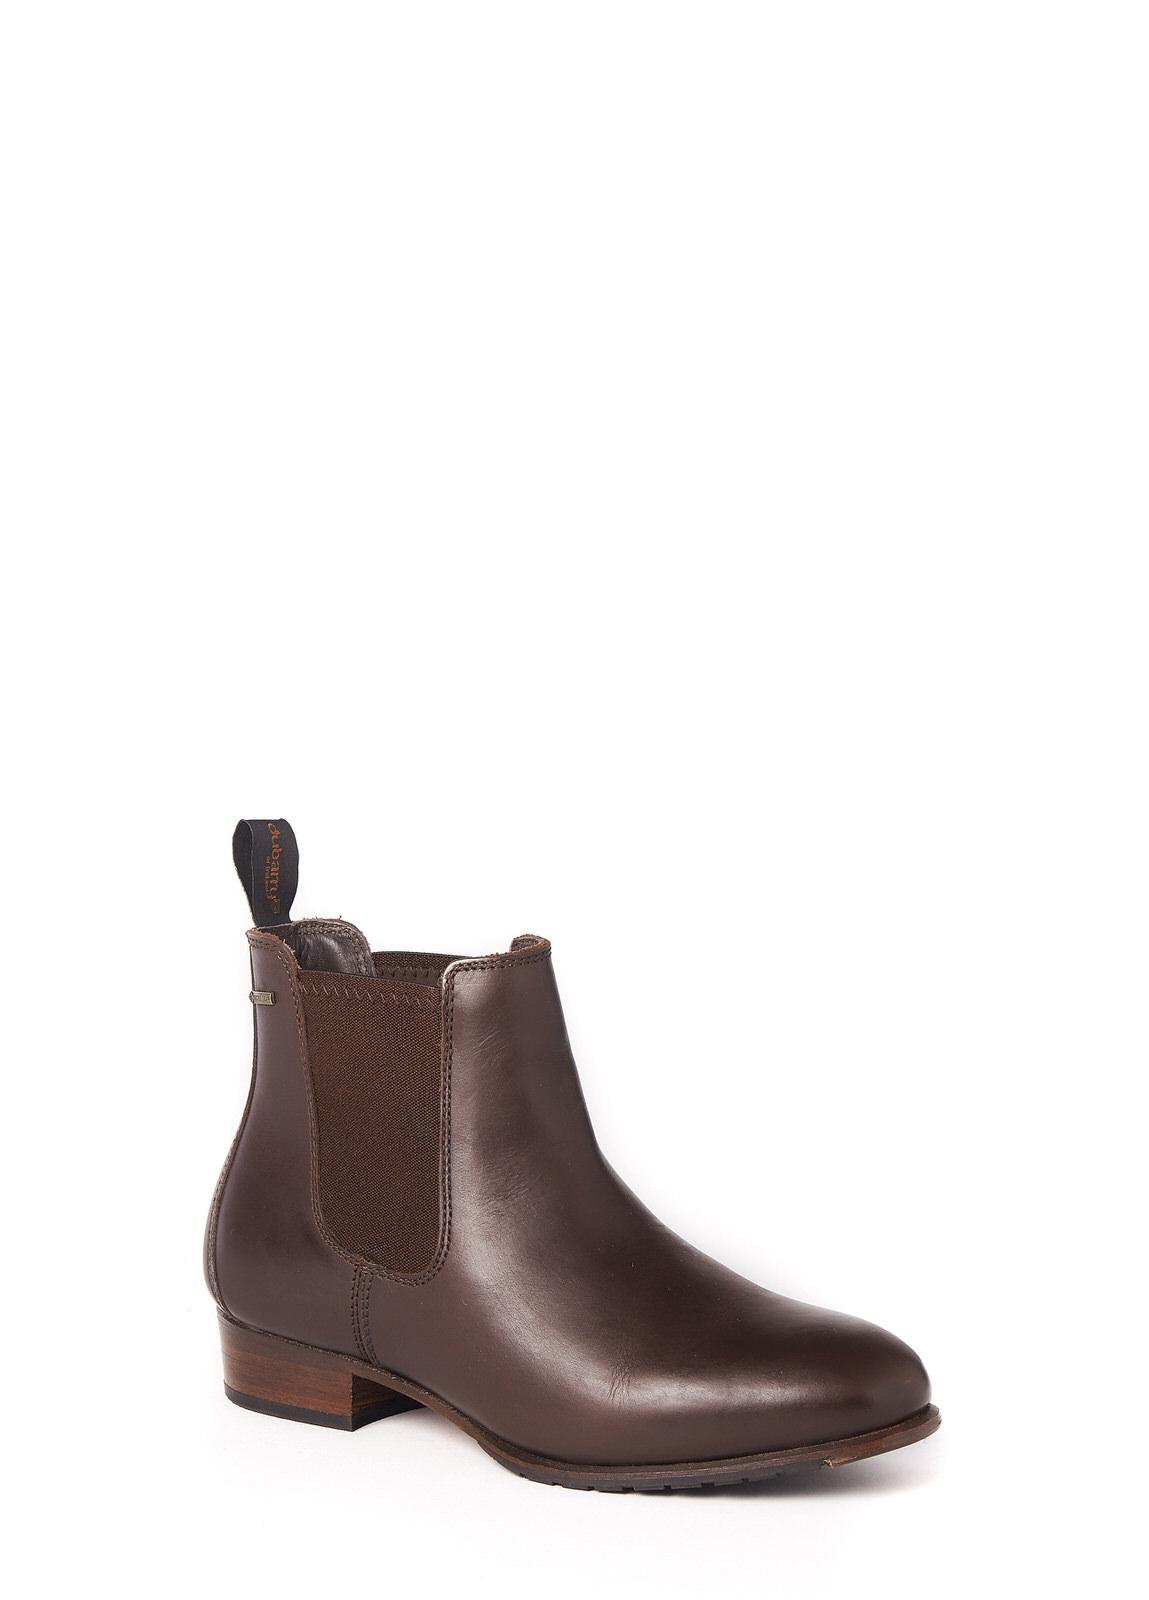 Dubarry_Cork Leather Soled Boot - Mahogany_Image_1